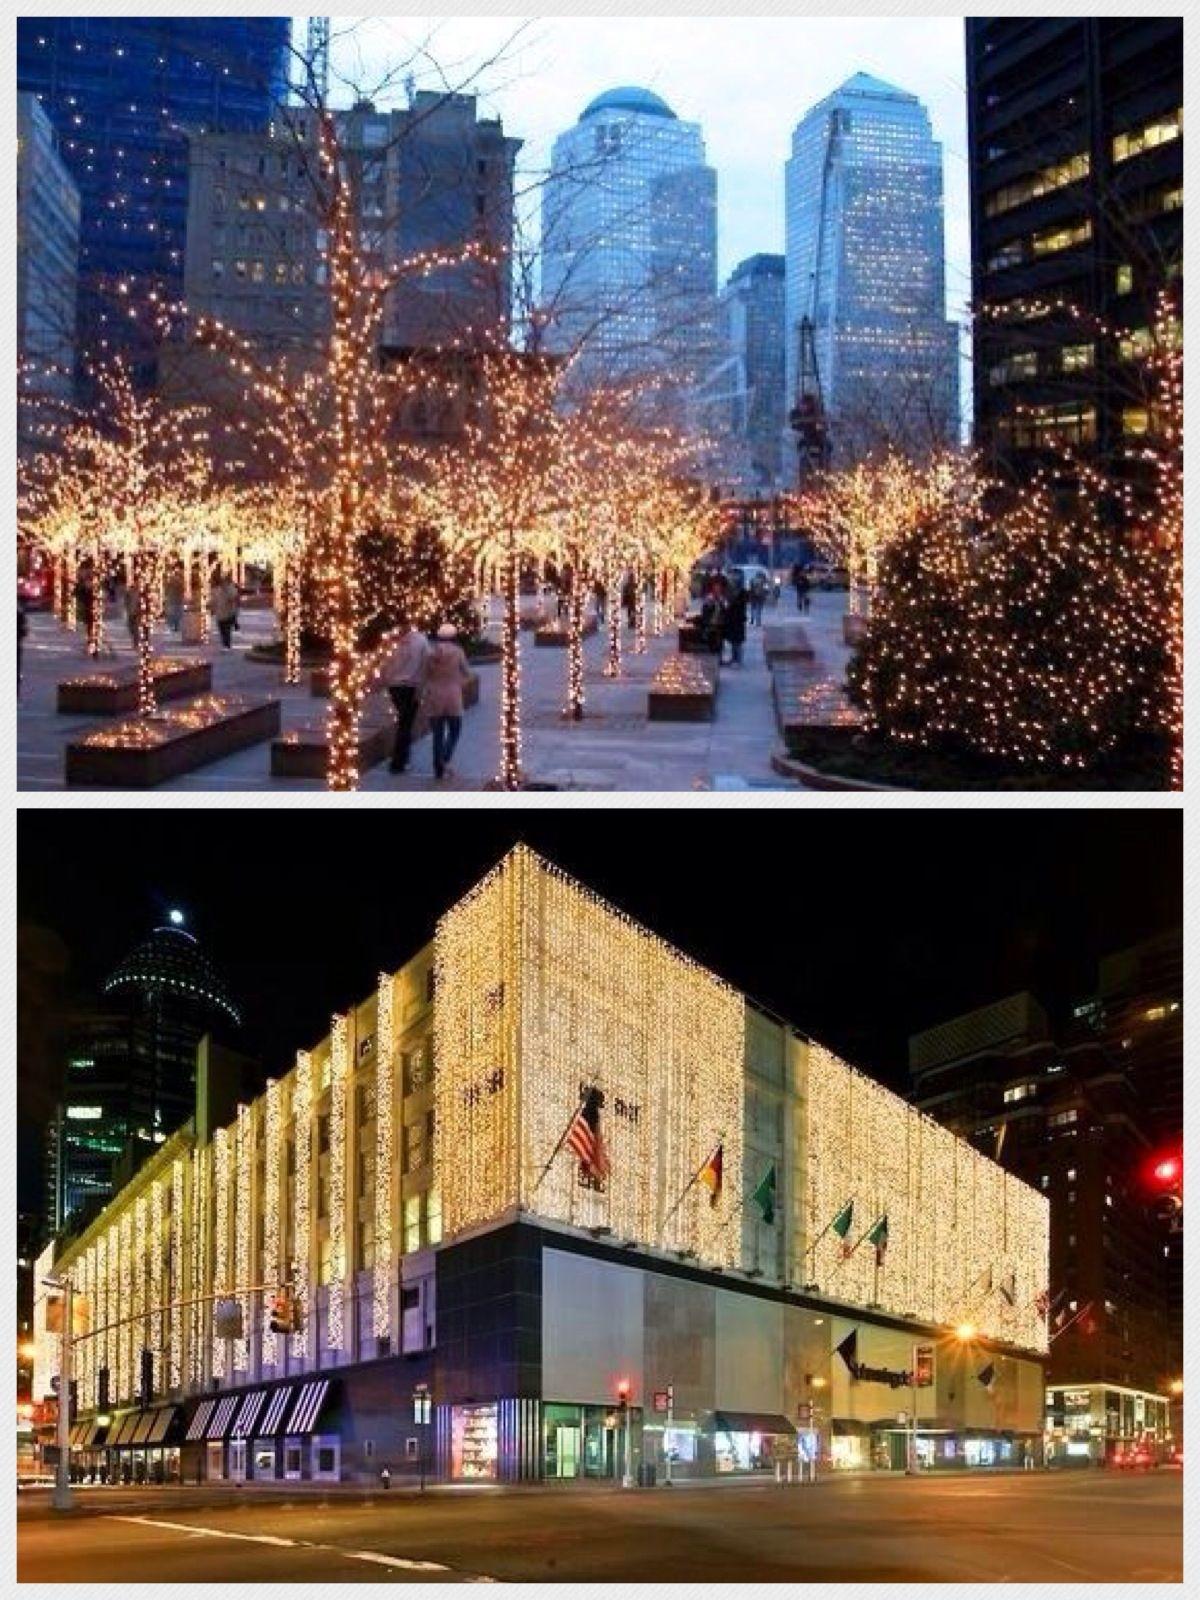 Top Christmas At Zuccotti Park Nyc Bottom Bloomingdales New York Christmas Christmas Spectacular Nyc